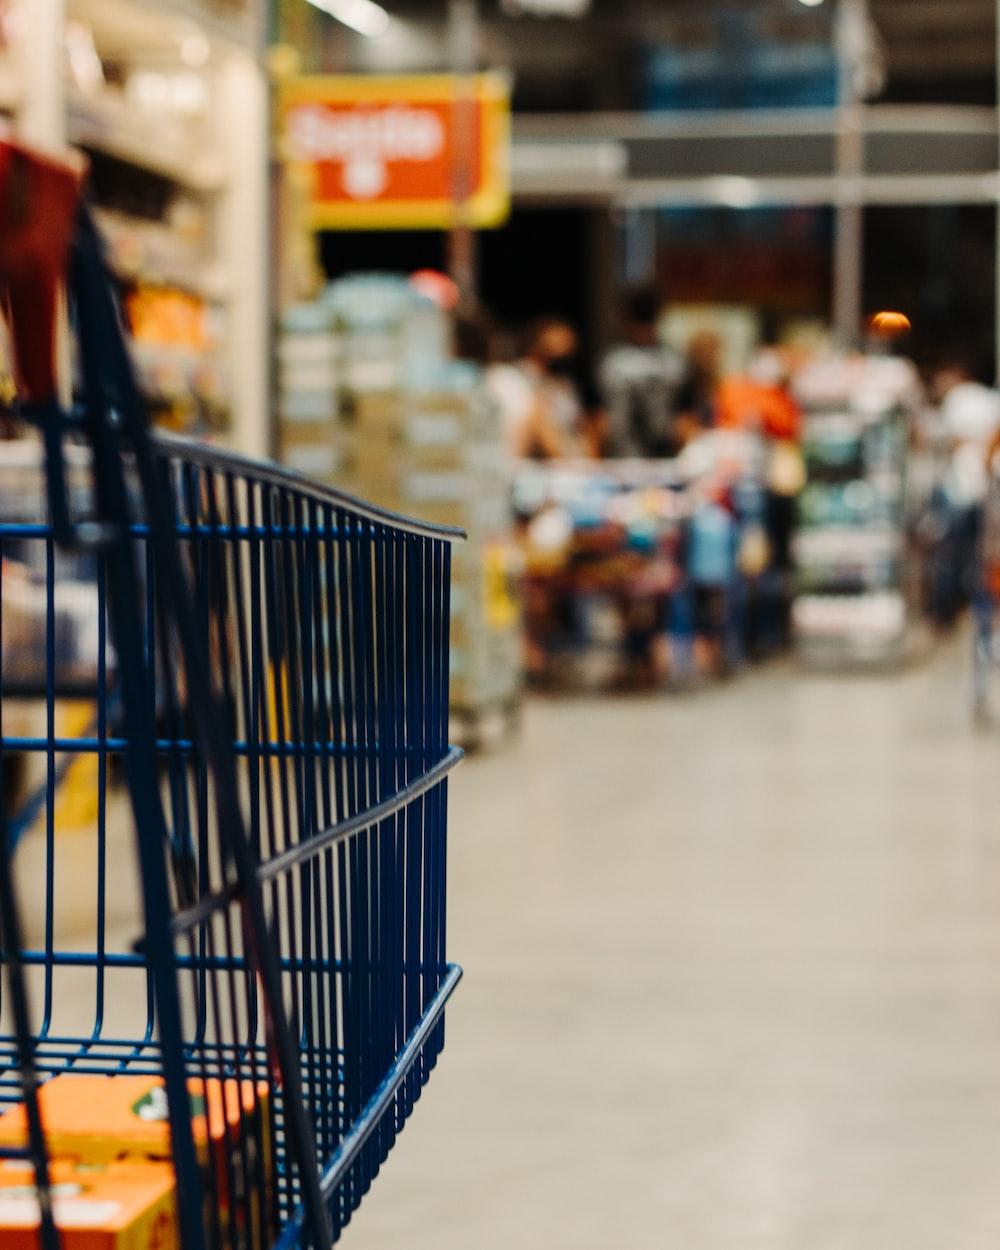 blue shopping cart on street during daytime